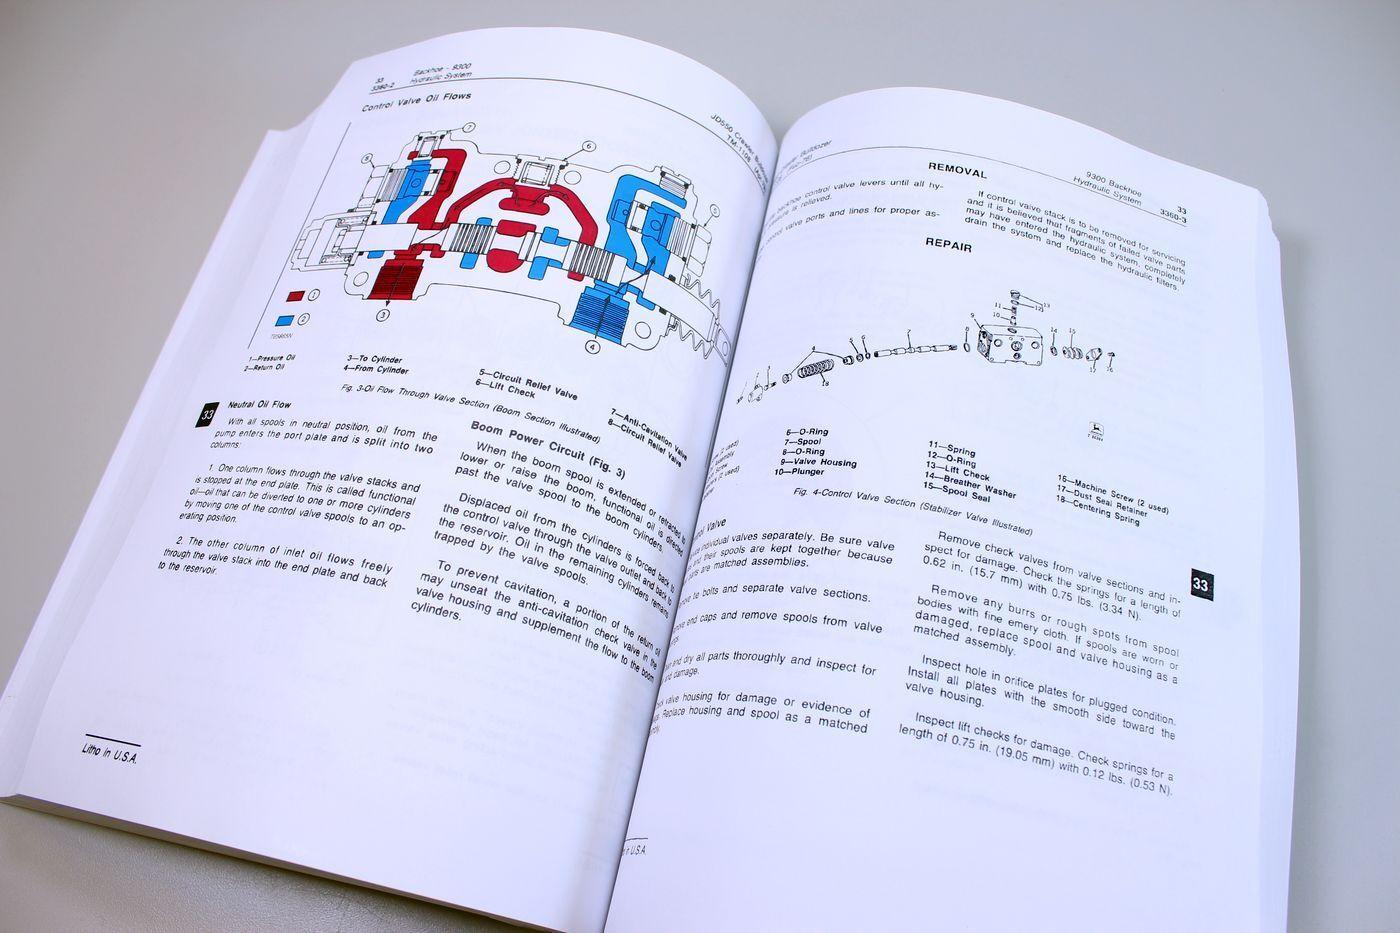 panasonic sc hc37 hc37ec hc37eg hc37ef hc37ee service manual